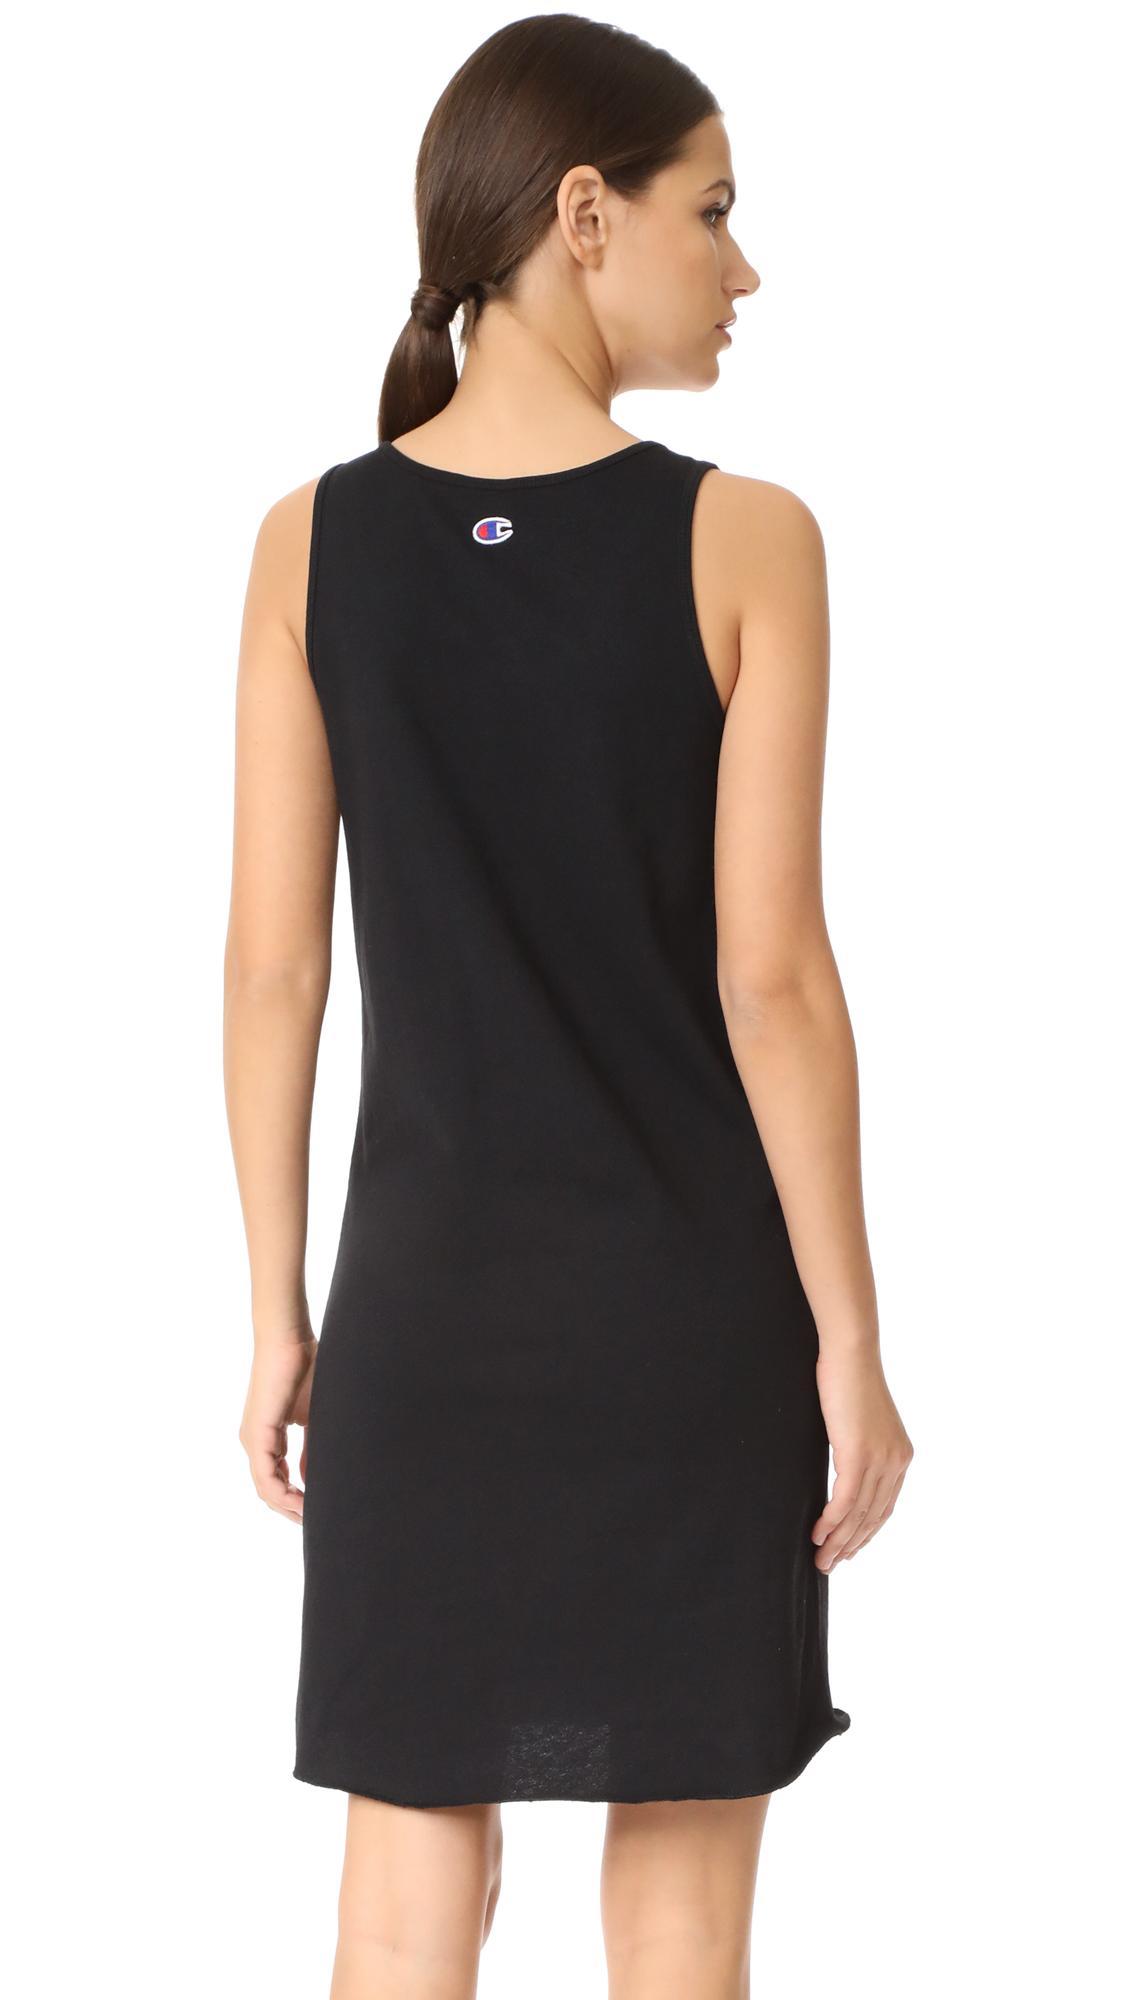 Lyst Champion Sleeveless Dress In Black